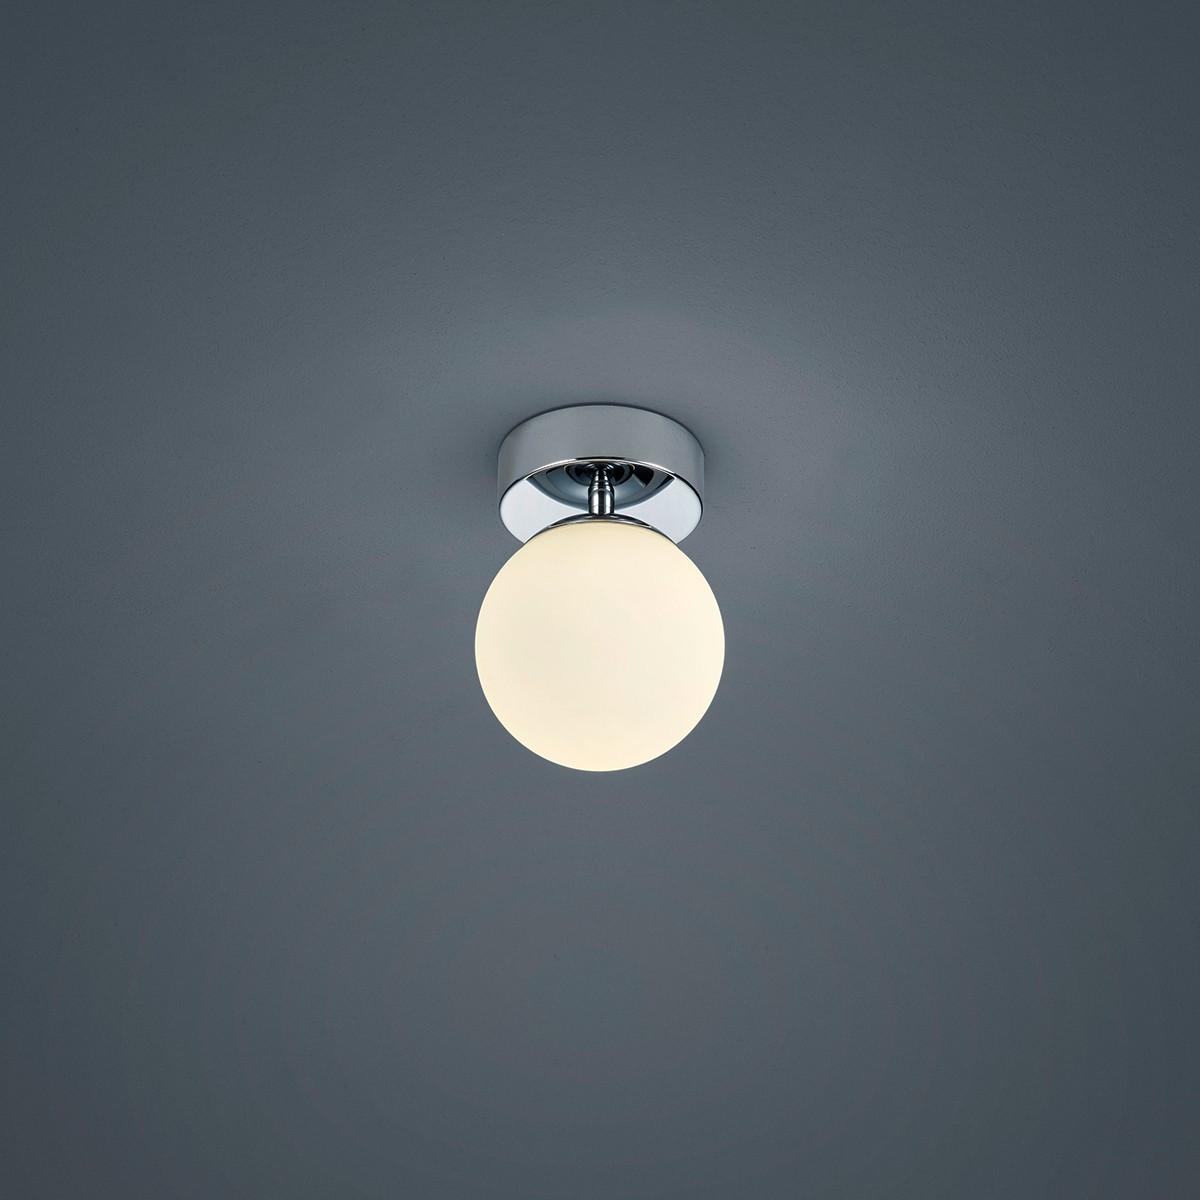 Helestra Keto Deckenleuchte, kugelförmig, Chrom - Opalglas